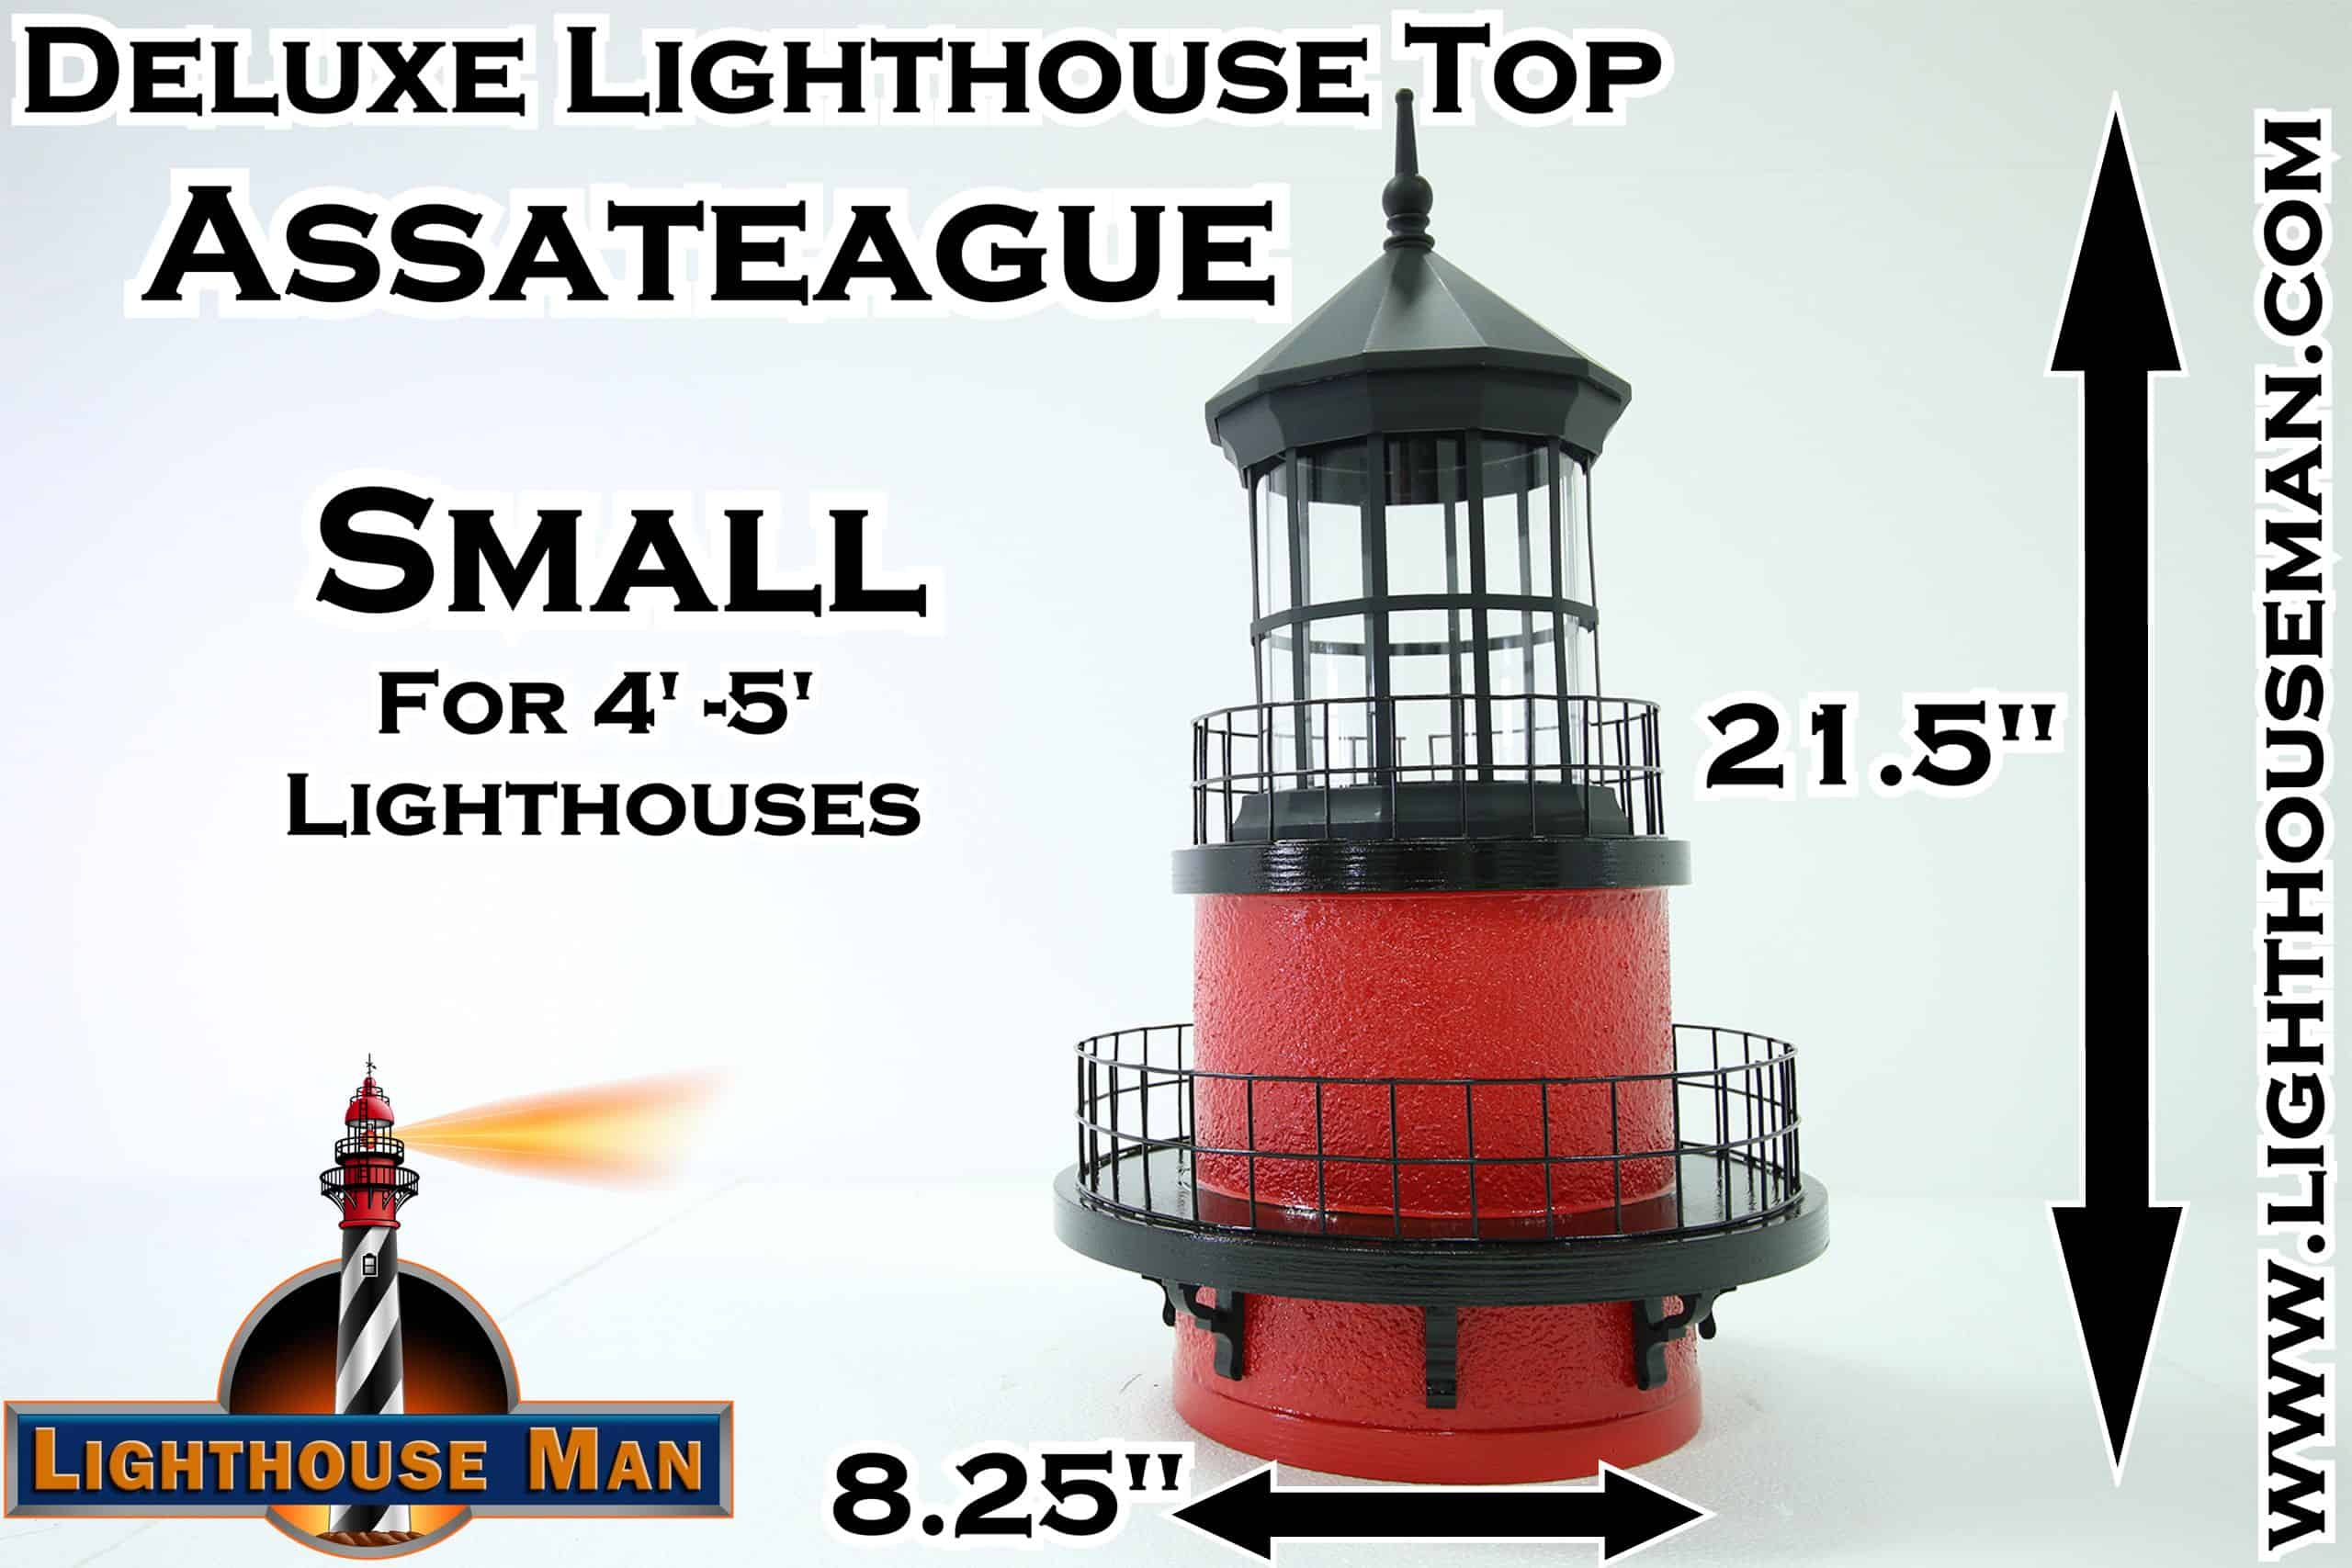 Deluxe Small Assateague Lighthouse Top